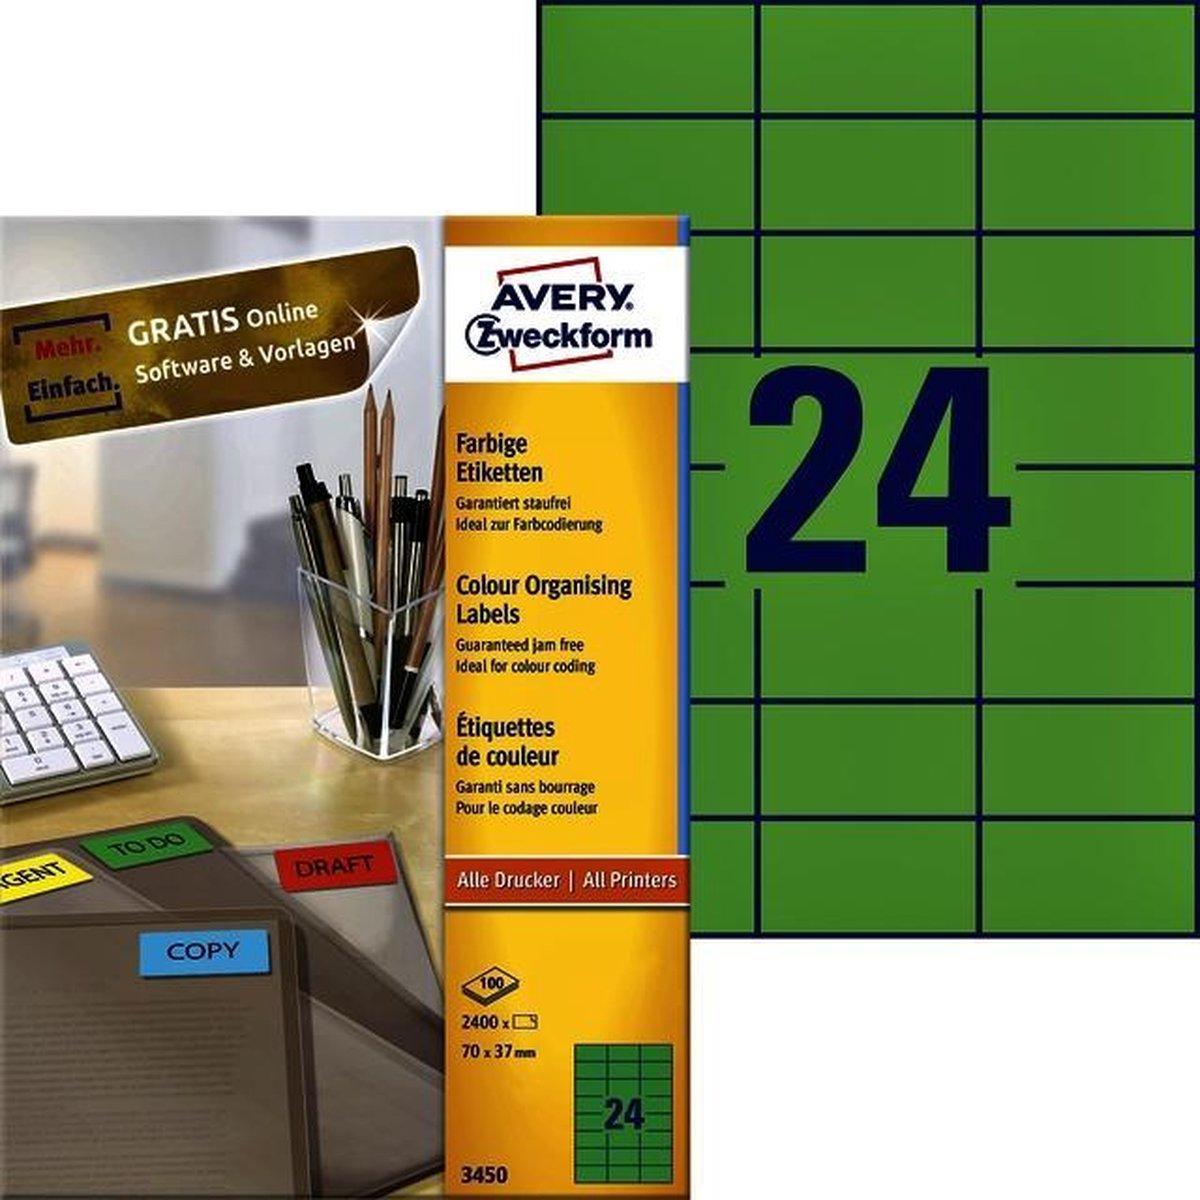 Avery Gekleurde universele etiketten formaat 70 x 37 mm (b x h) 2.400 stuks groen